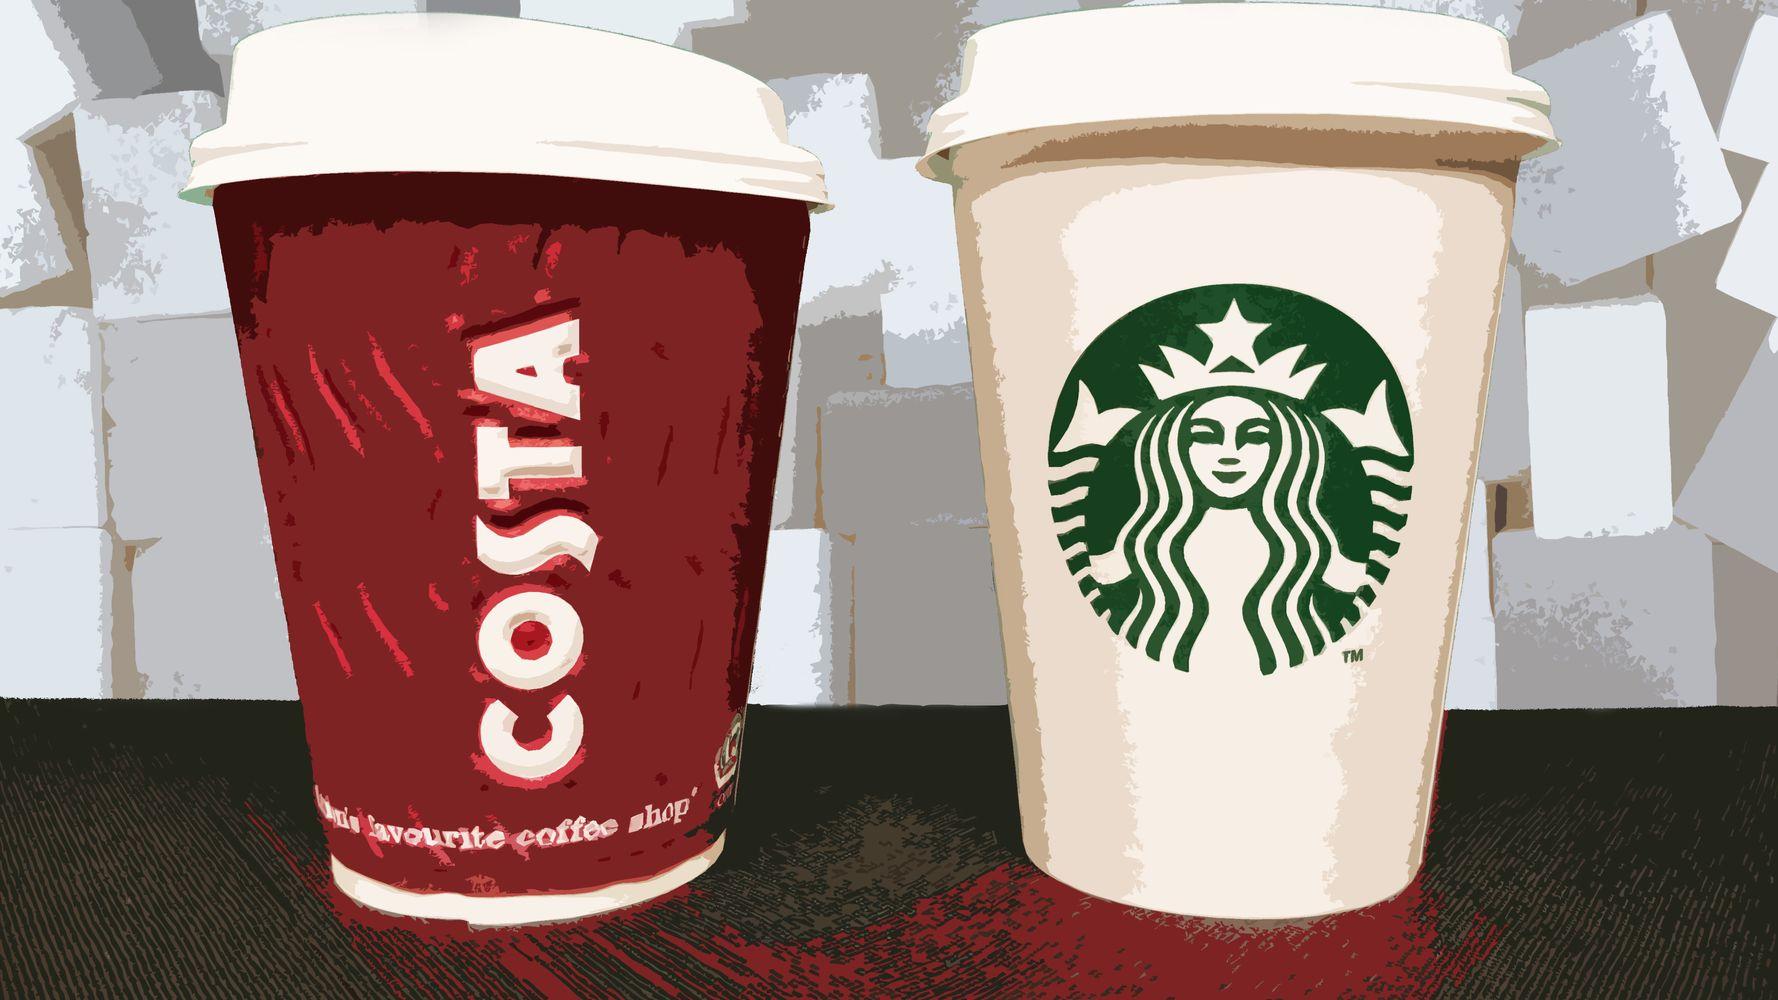 Drinking One Starbucks Pumpkin Spice Latte Exceeds Your